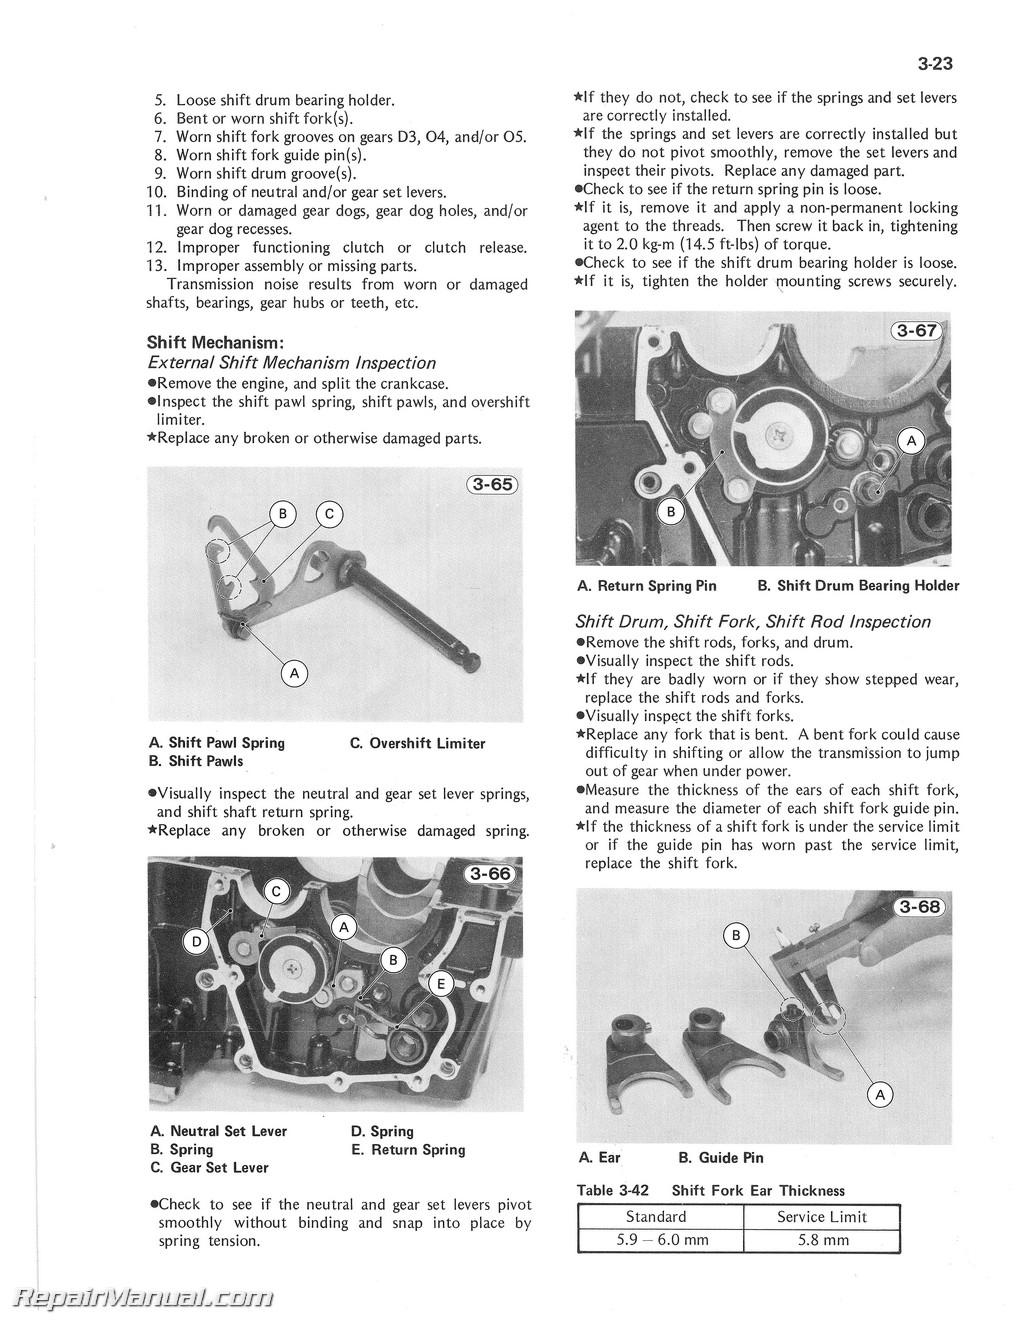 1982 kz1000 wiring diagram 1991 volvo 240 radio 1981 kawasaki kz1100 motorcycle repair service